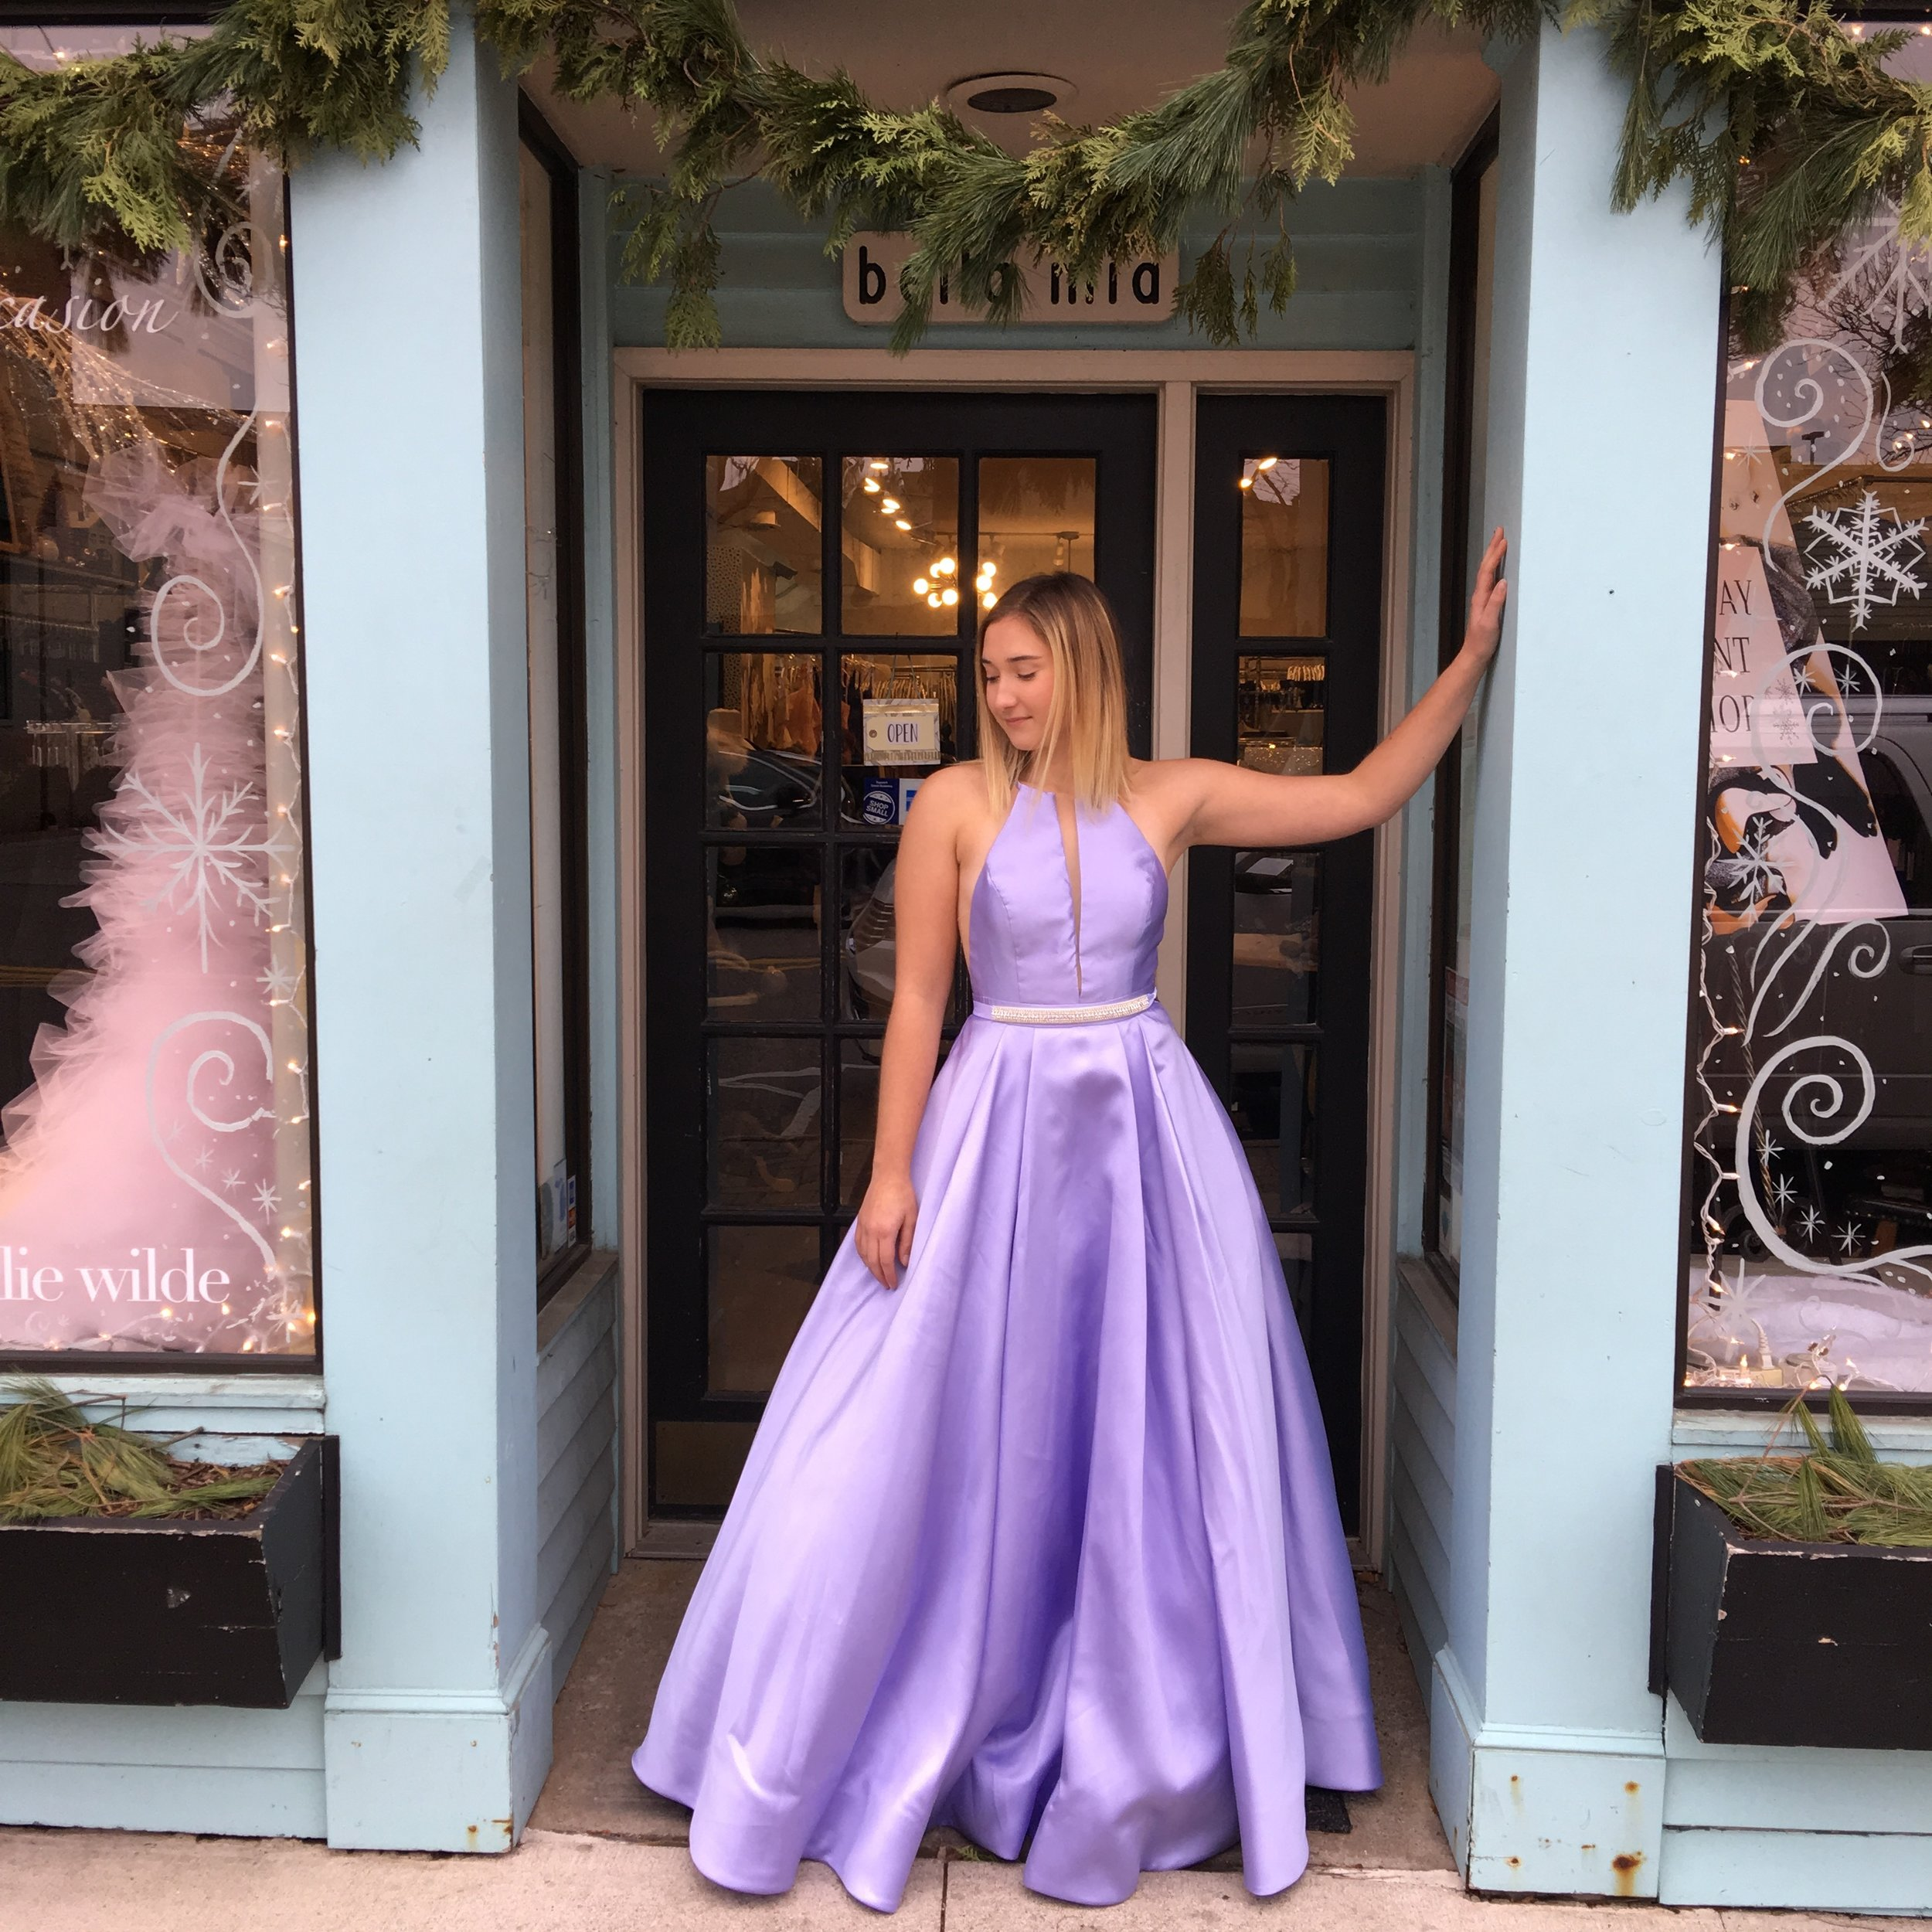 Bella-Mia-Dressed-Up-Downtown-Plymouth-Formal-Wear-Store-Sherri-Hill.JPG